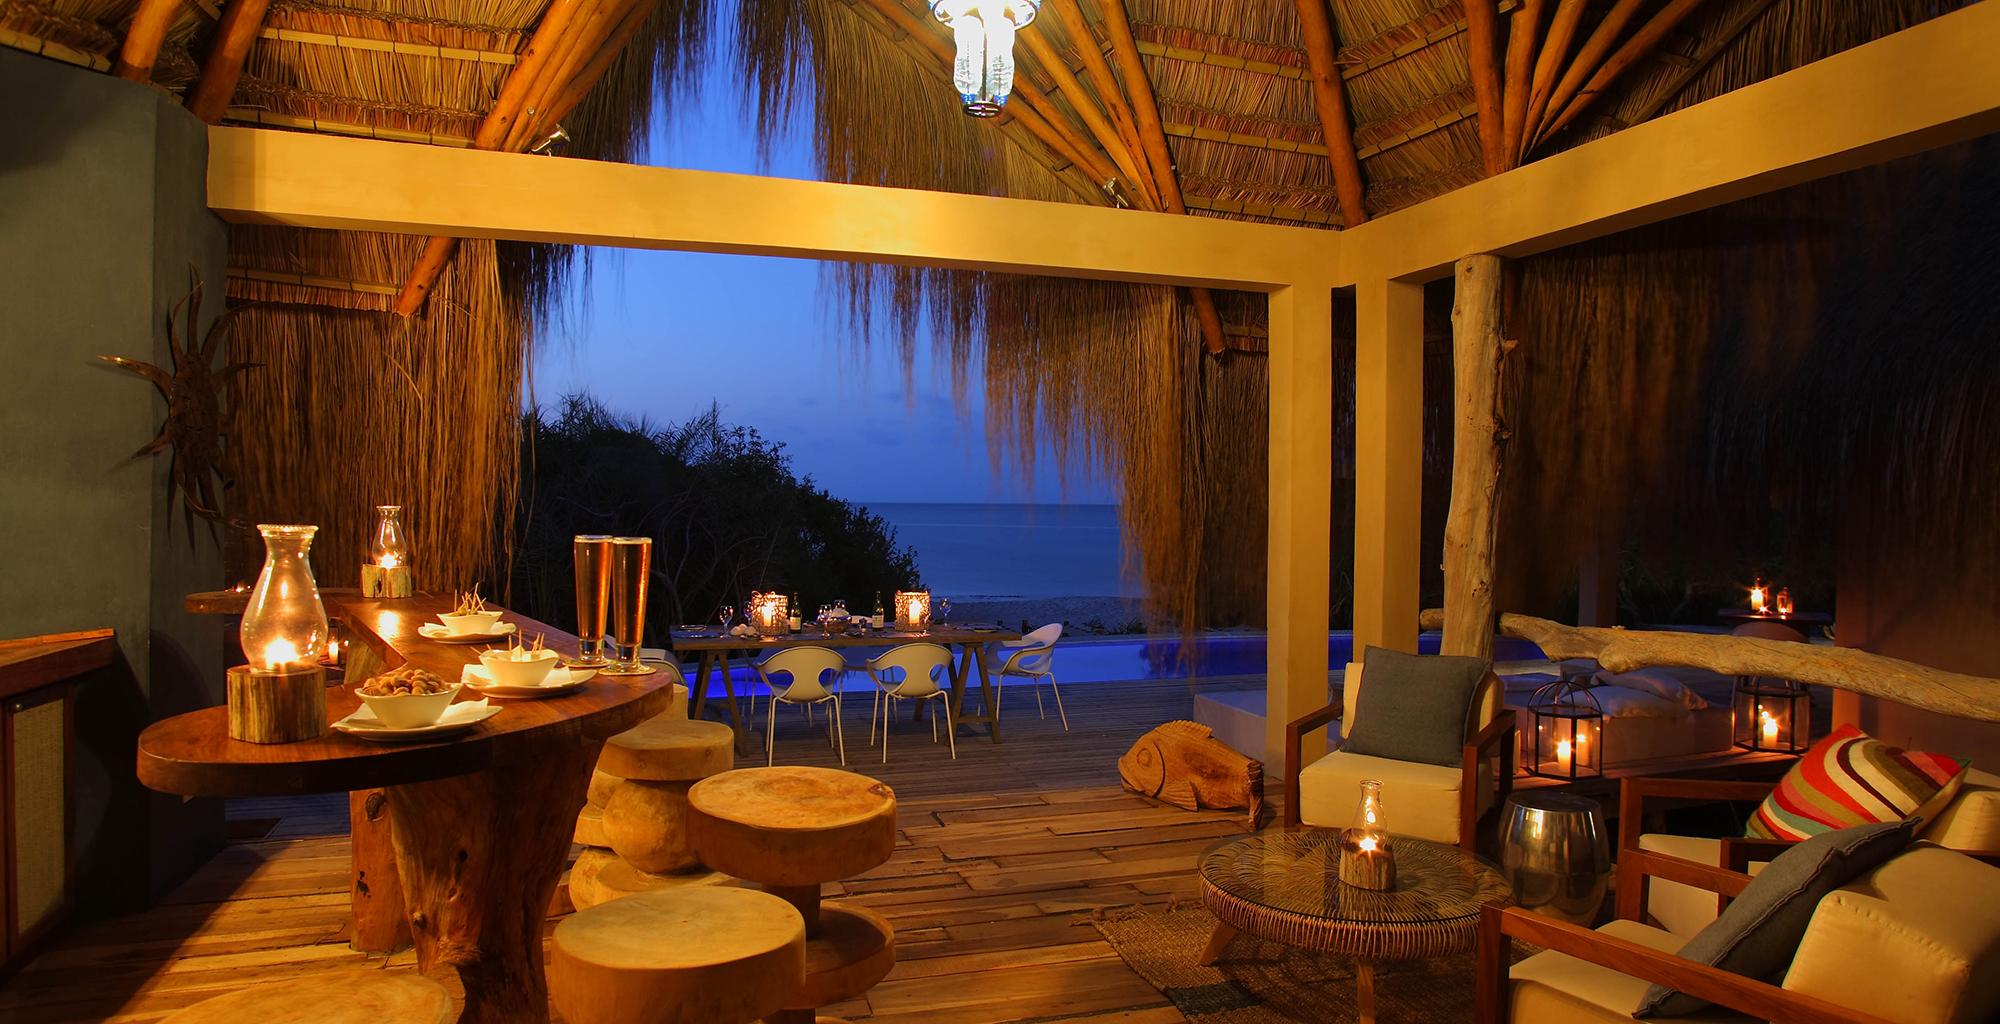 Mozambique-Bazaruto-Archipelago-Azura-Benguerra-Presidential-Star-Bar